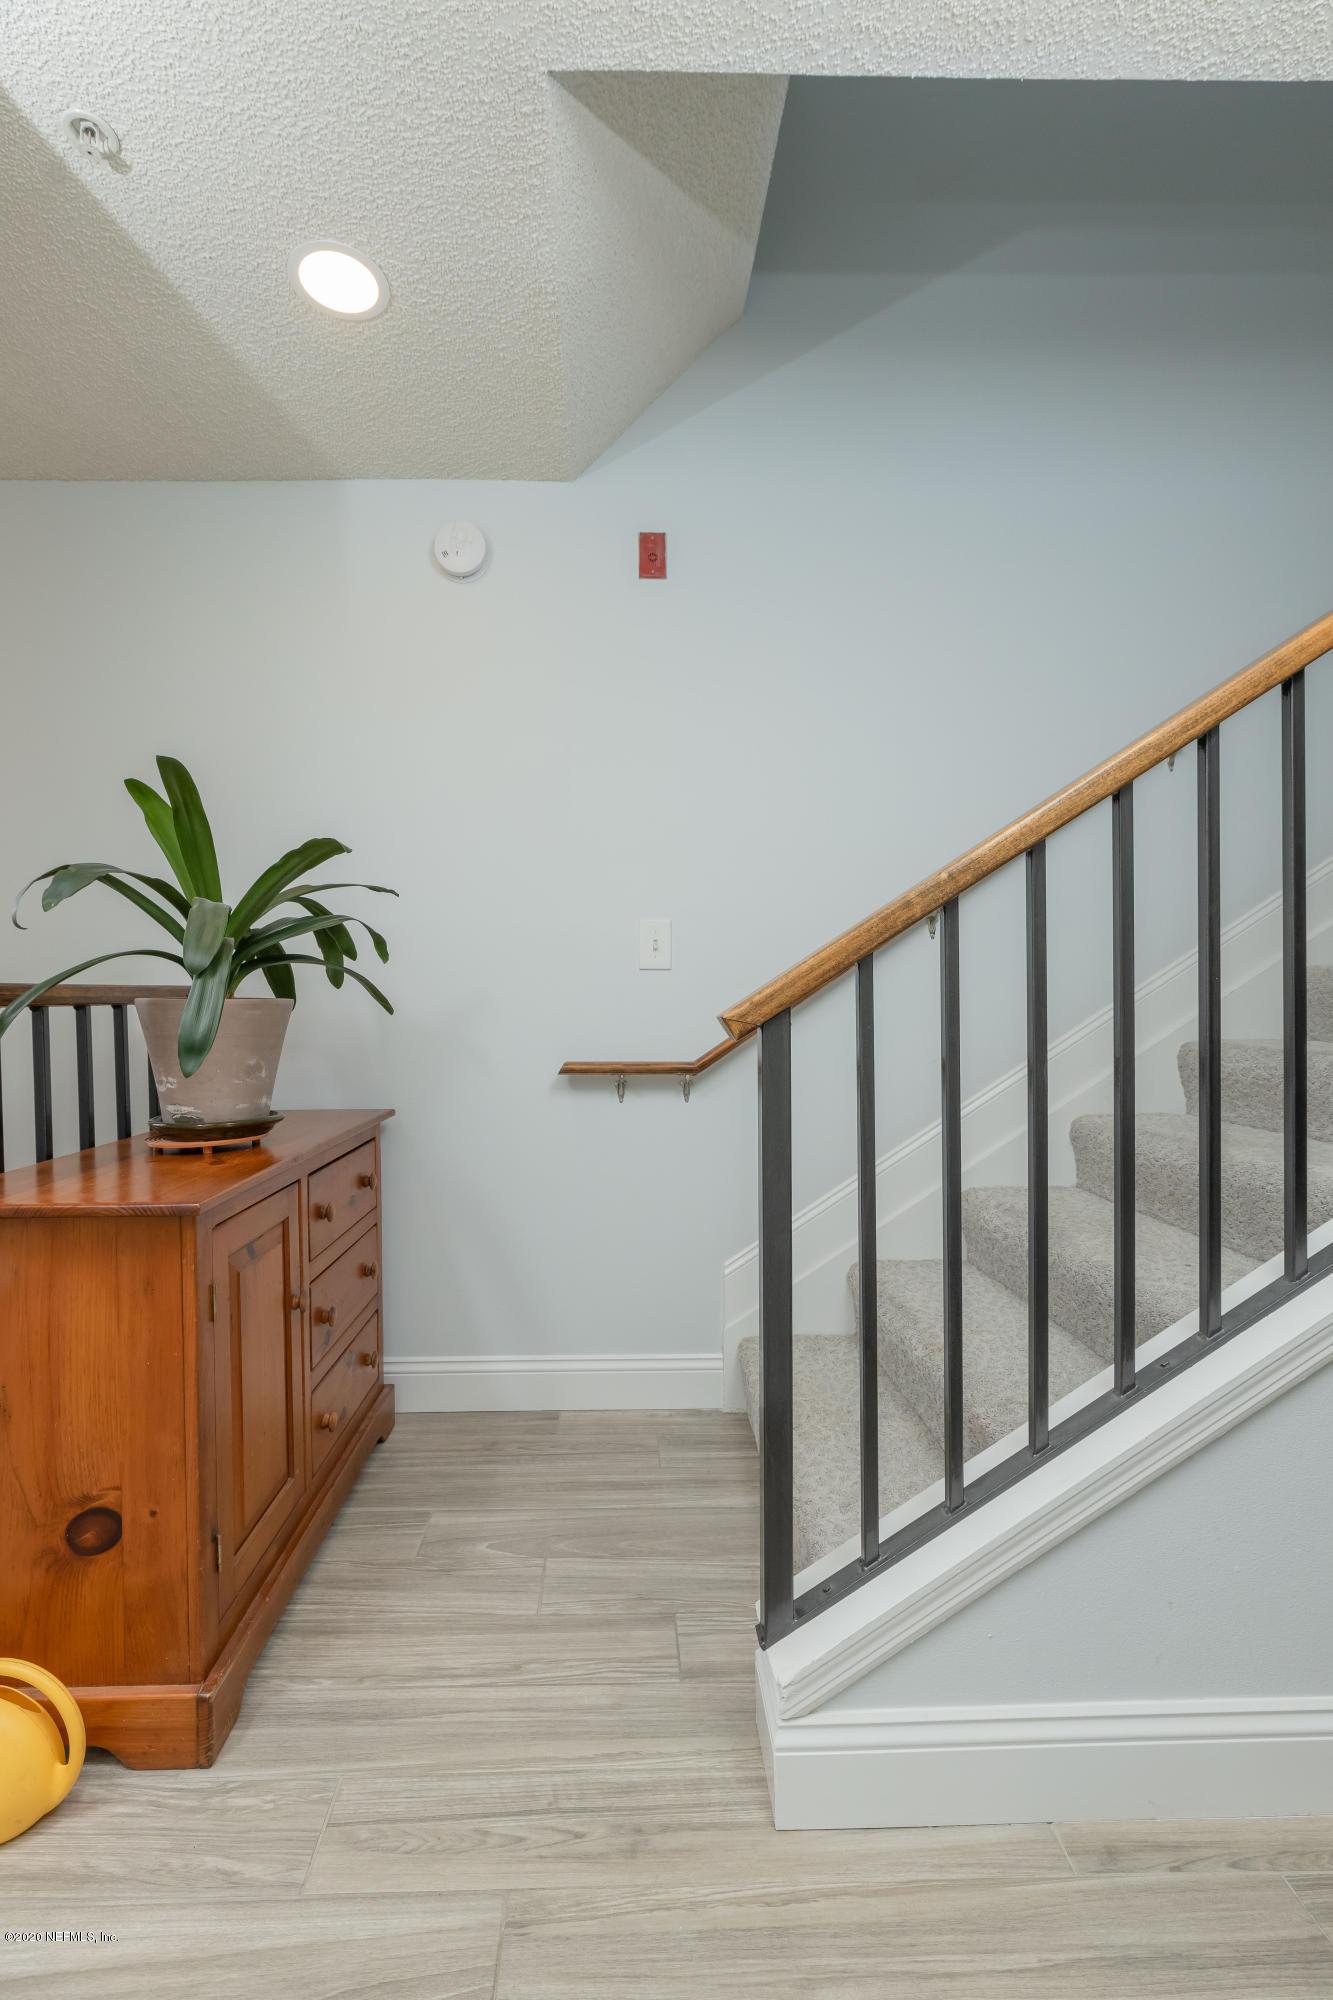 1050 BELLA VISTA, ST AUGUSTINE, FLORIDA 32084, 3 Bedrooms Bedrooms, ,2 BathroomsBathrooms,Residential,For sale,BELLA VISTA,1082778